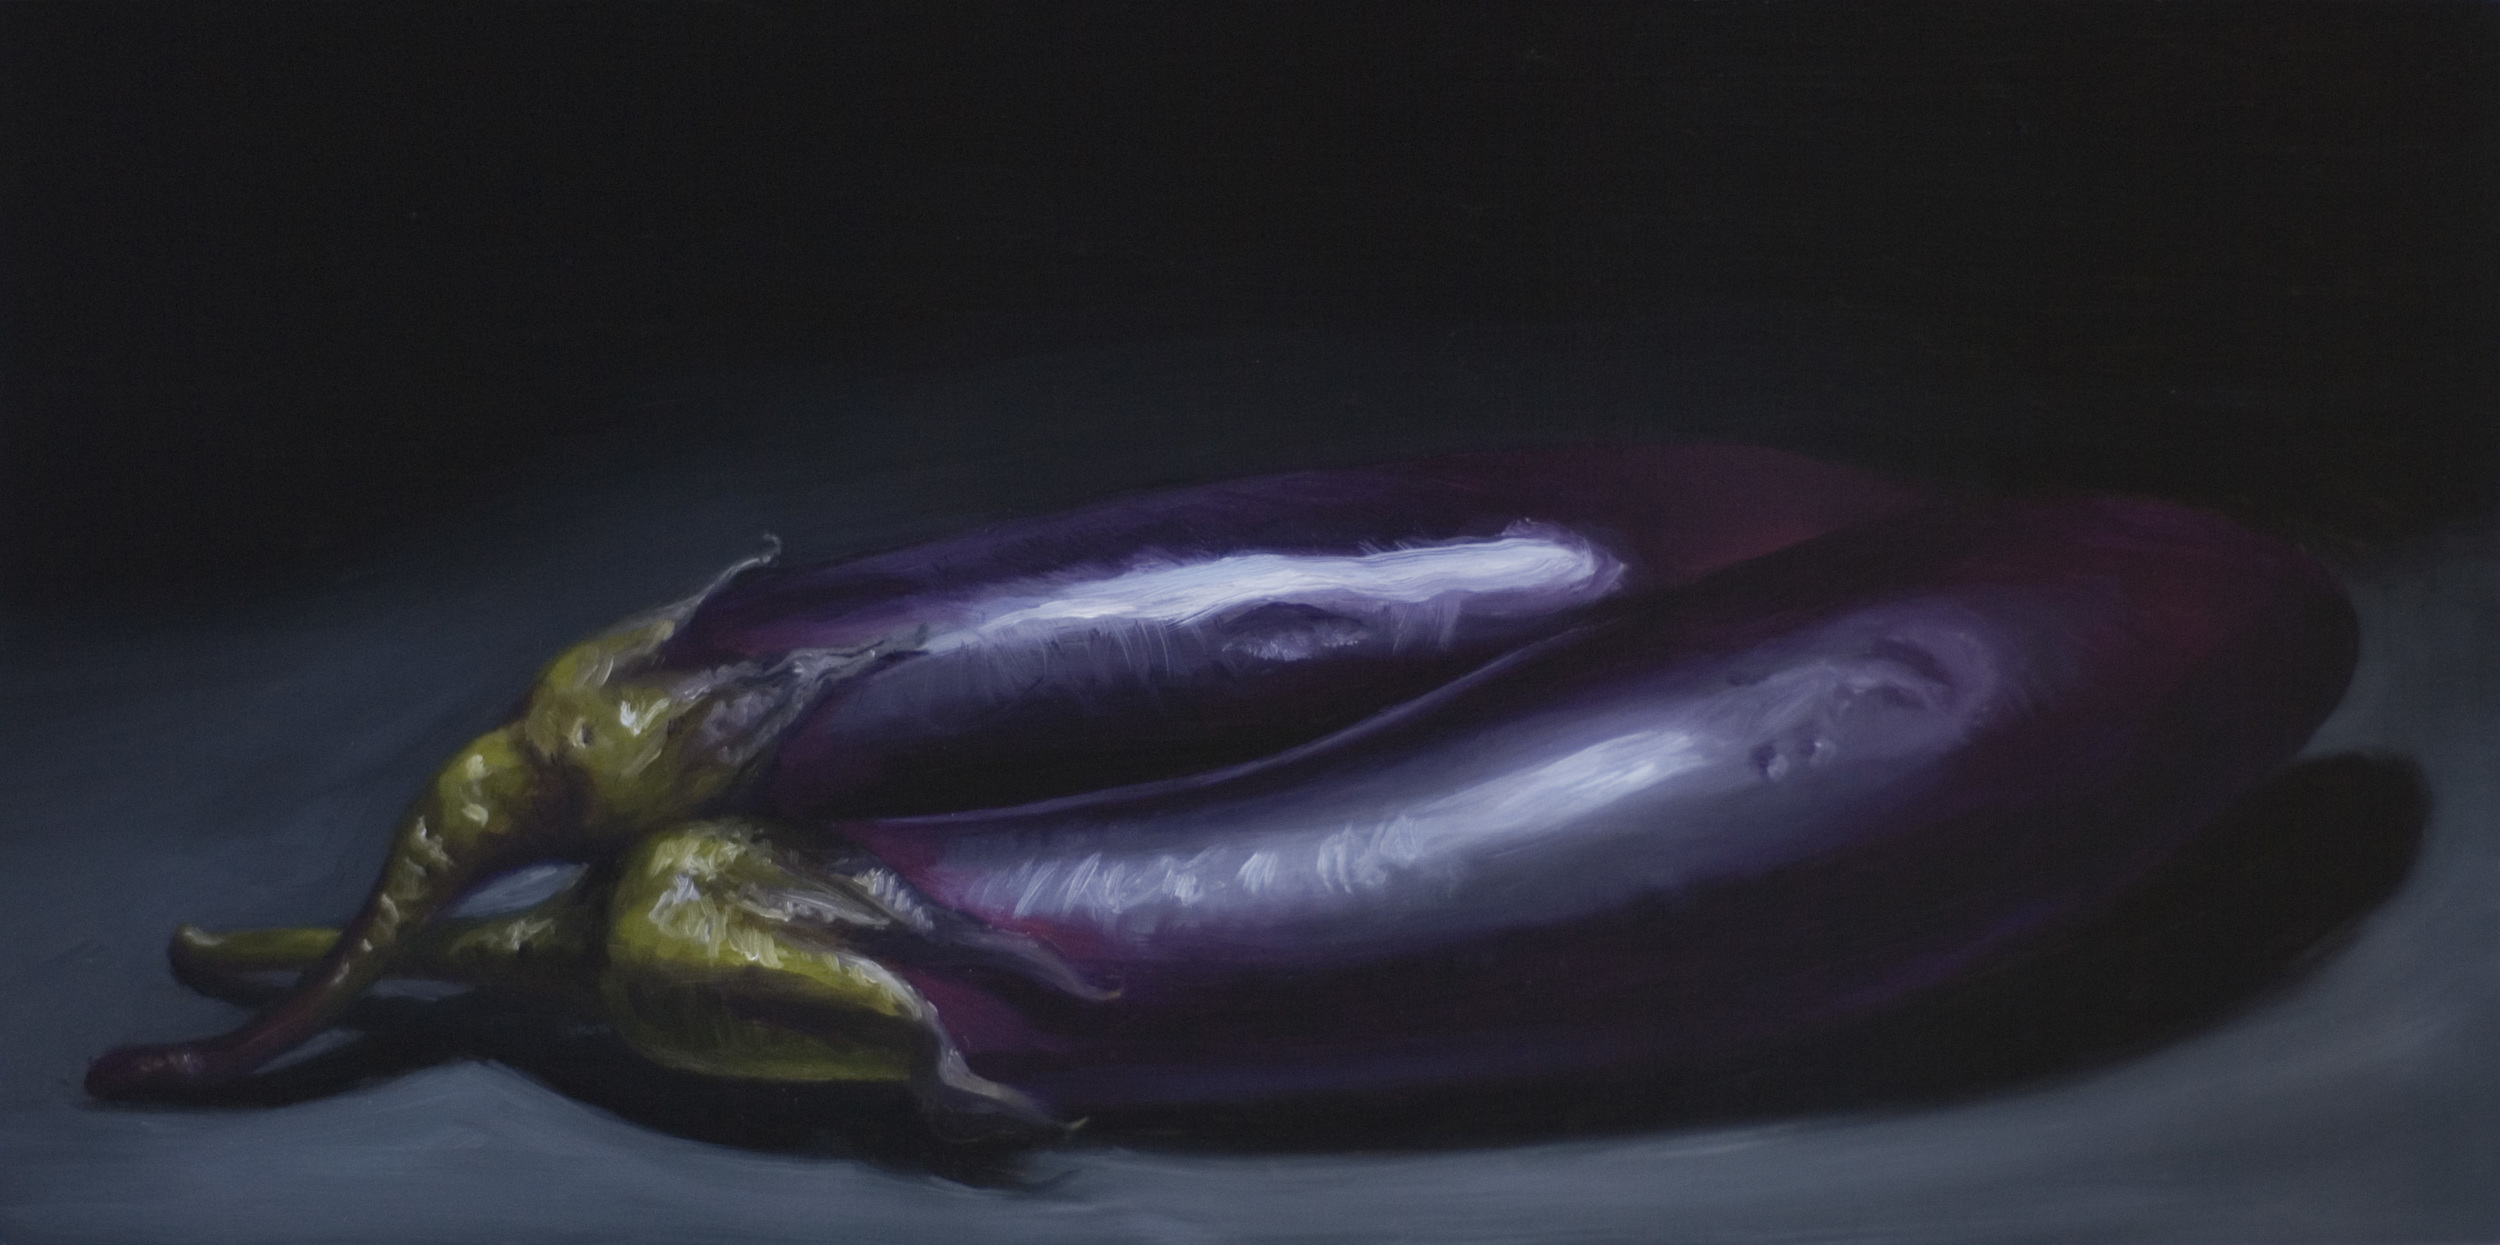 EggplantPainting